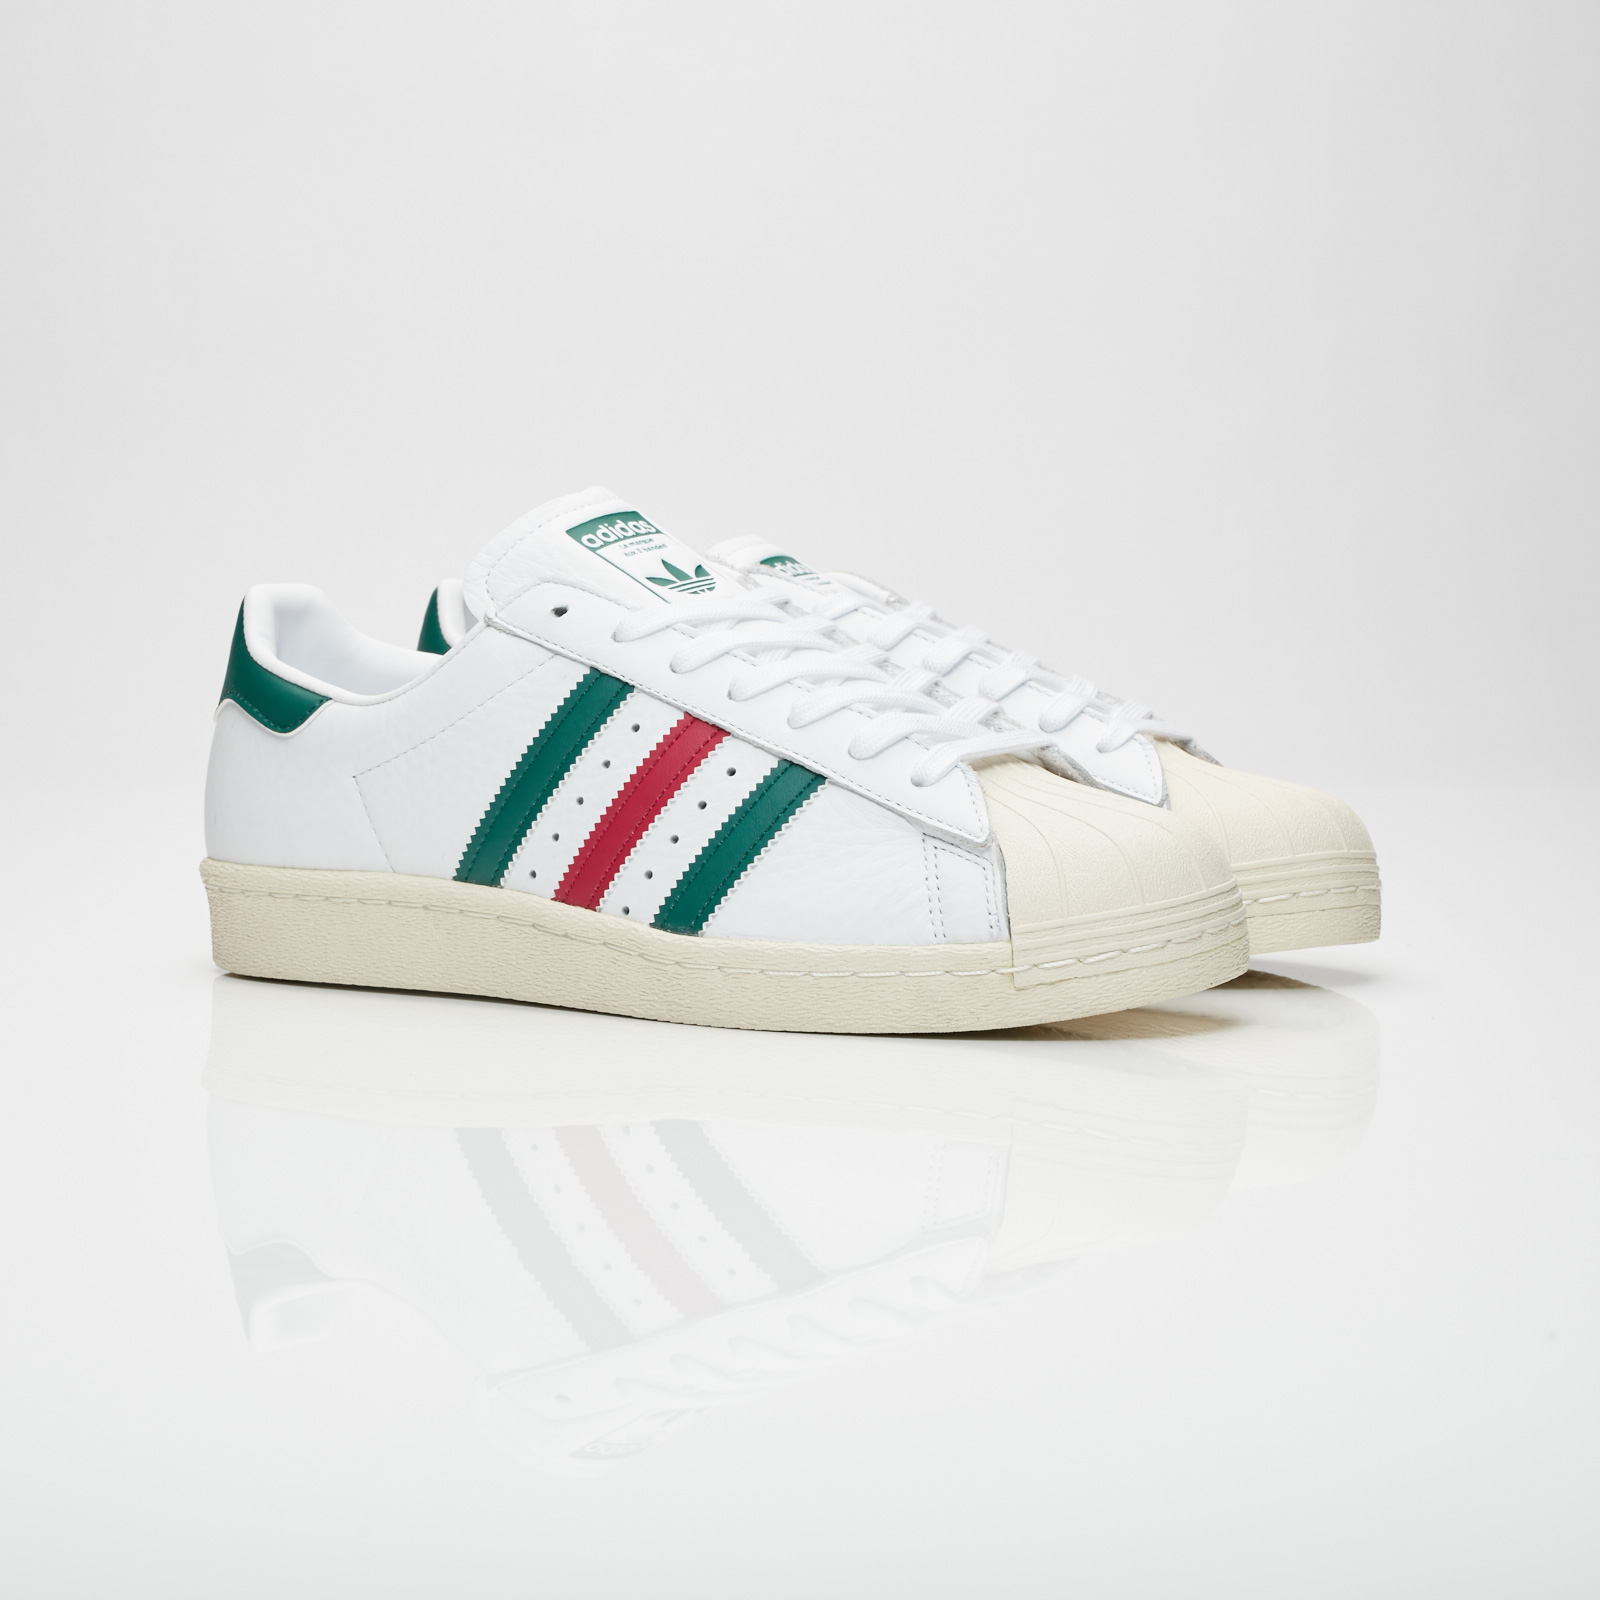 adidas Superstar 80s - Cq2654